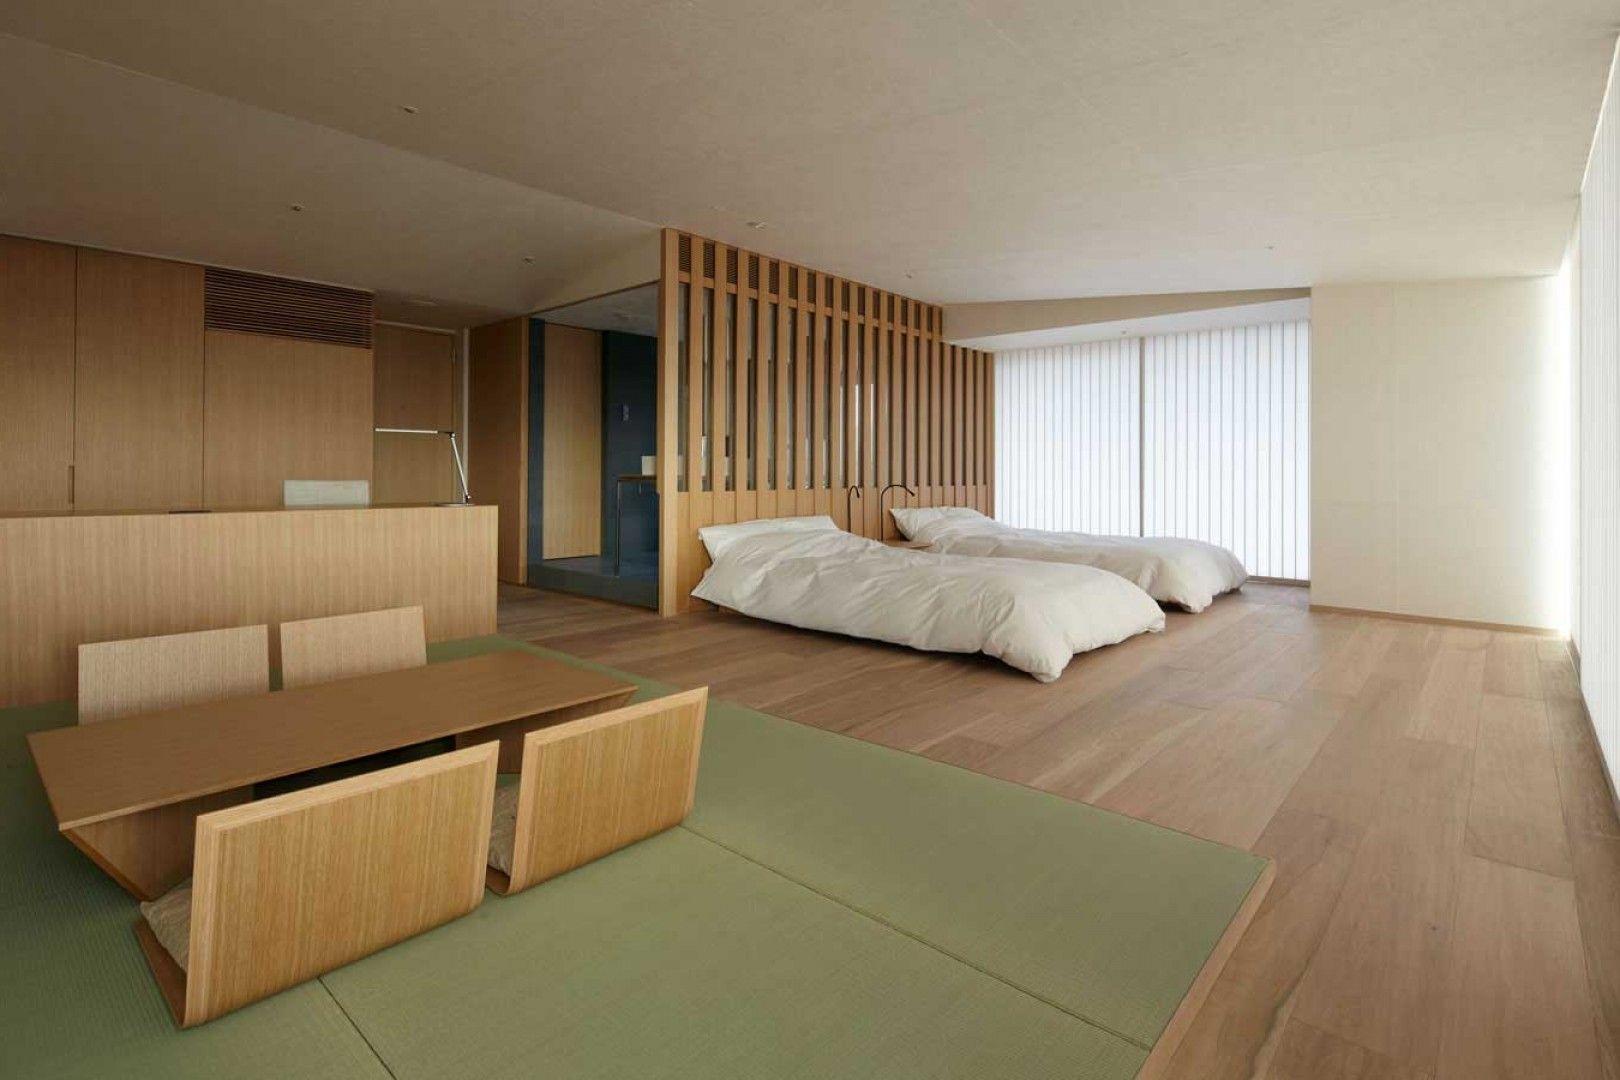 bedroom interior design in nigeria Interior